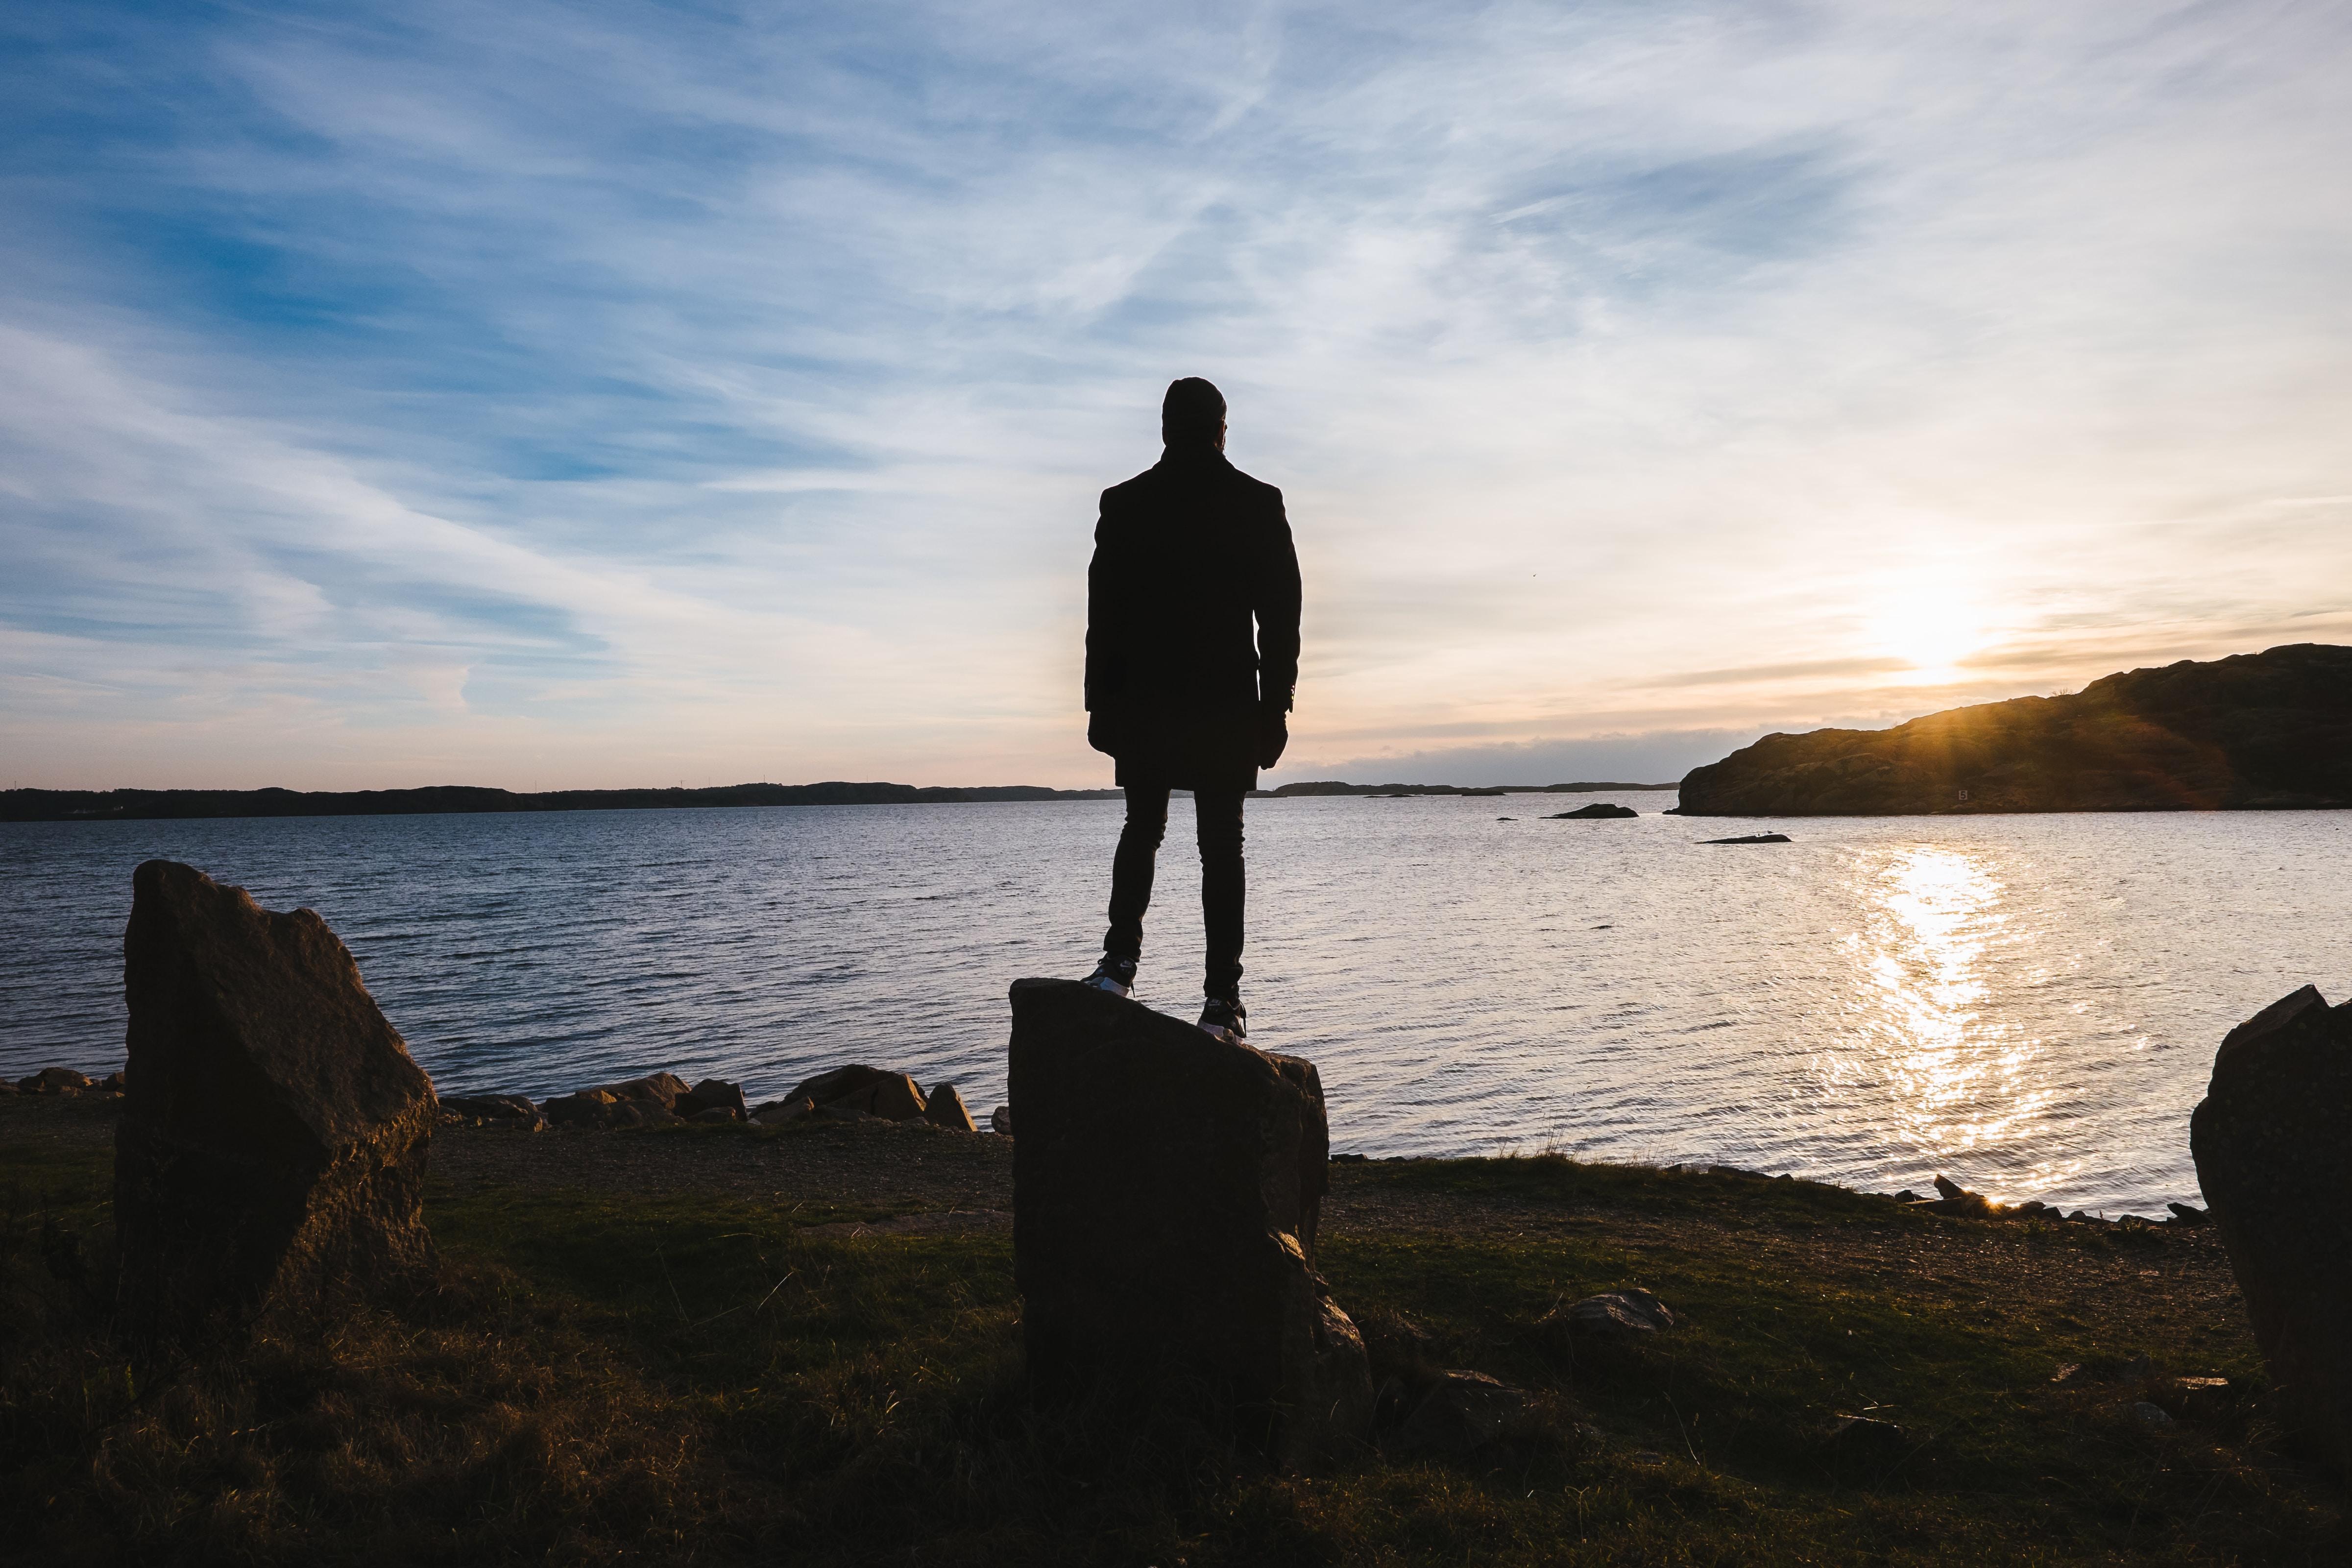 person standing on rock facing ocean